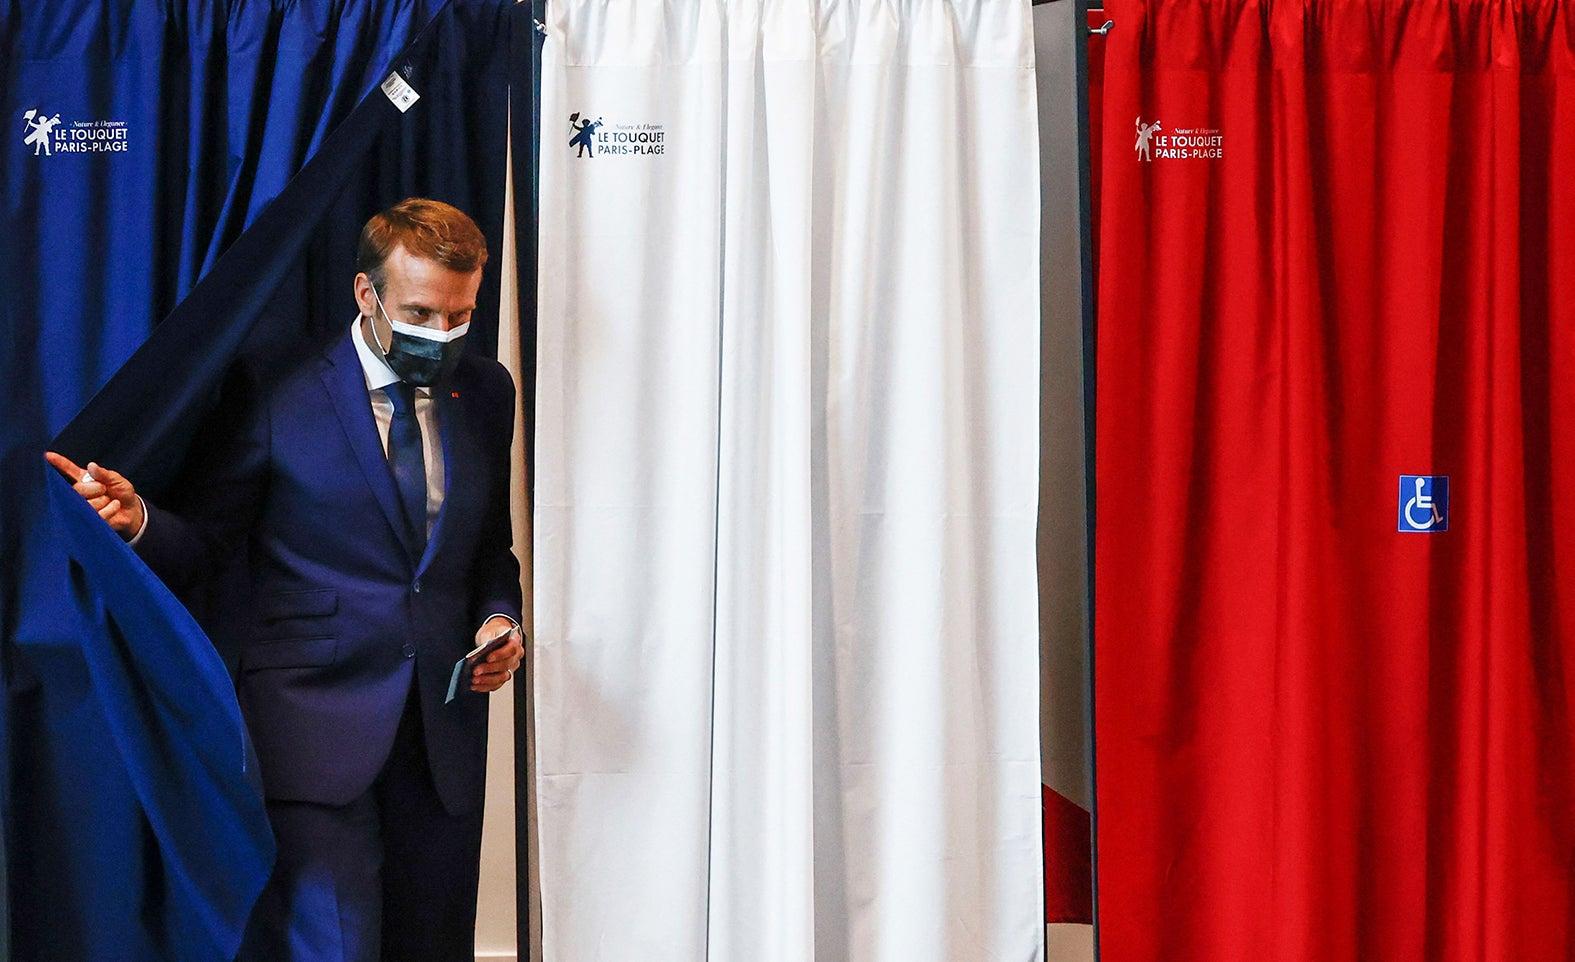 French election 2022: Can anyone beat President Emmanuel Macron?